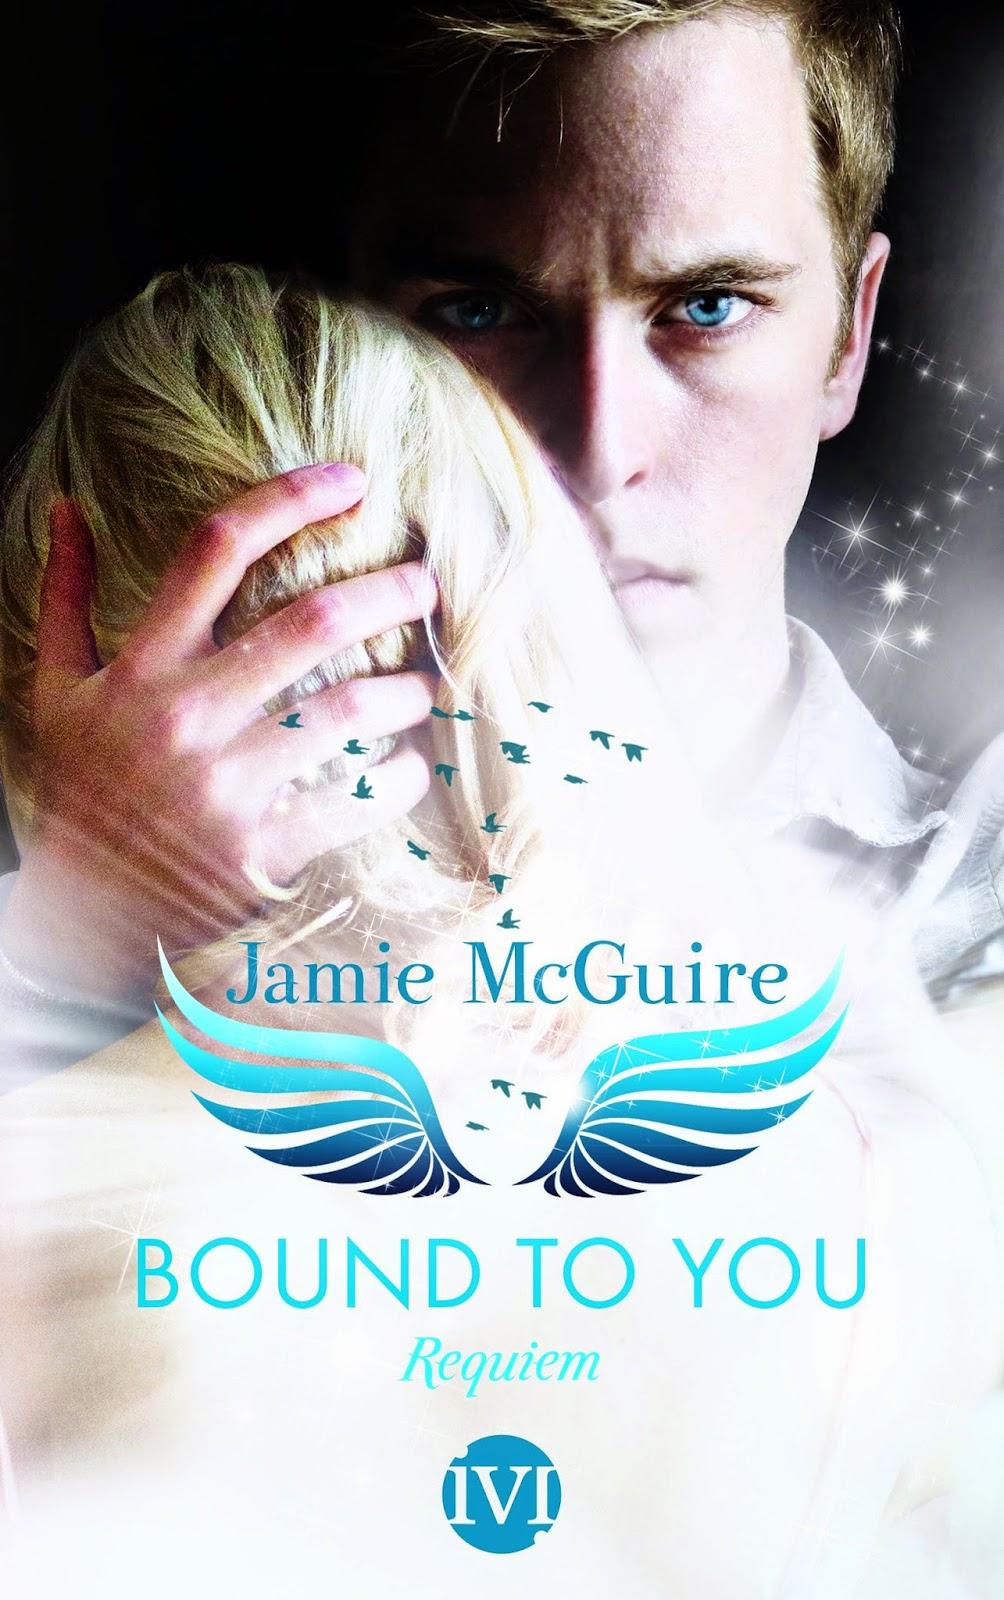 http://www.amazon.de/Bound-You-Requiem-Jamie-McGuire/dp/3492703291/ref=sr_1_2?s=books&ie=UTF8&qid=1425171281&sr=1-2&keywords=bound+to+you